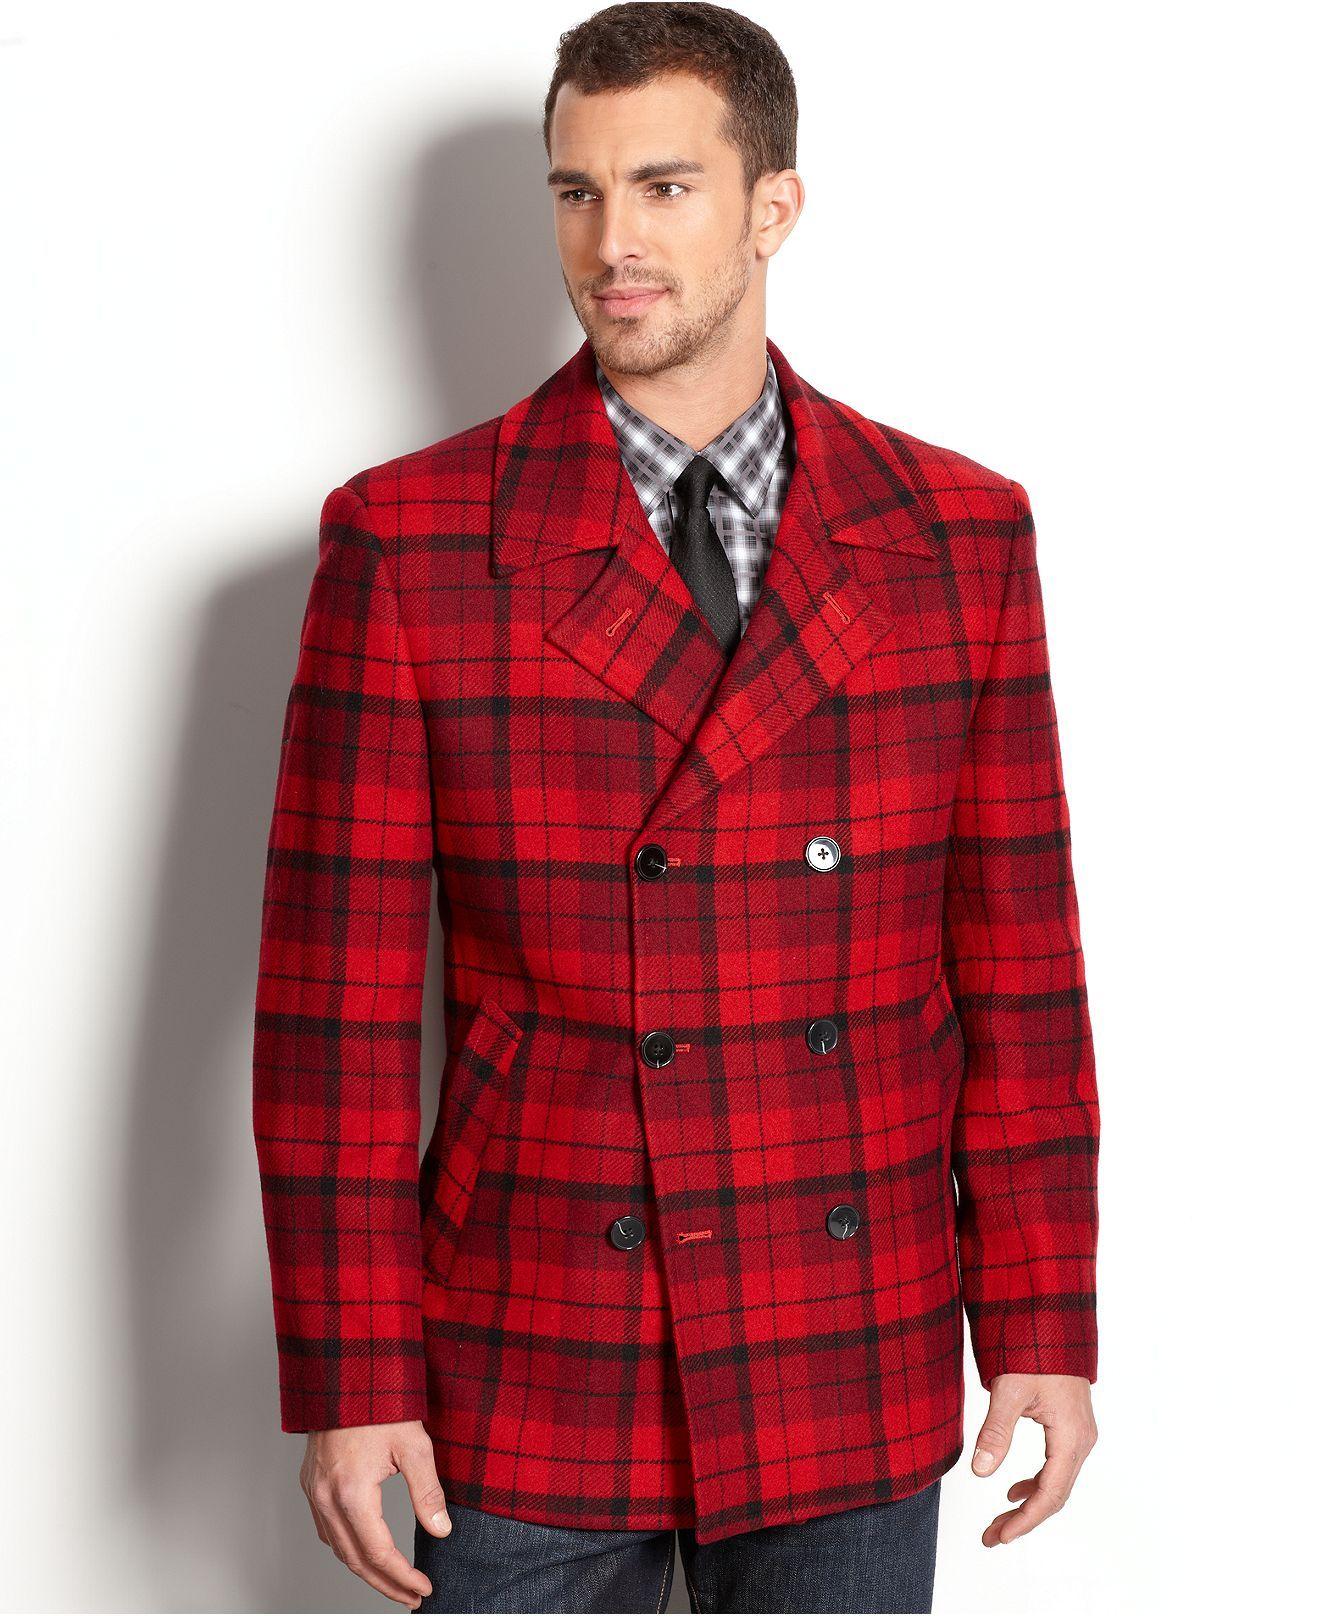 Tallia Orange Coat, Red Plaid Double Breasted Peacoat - Mens Coats ...